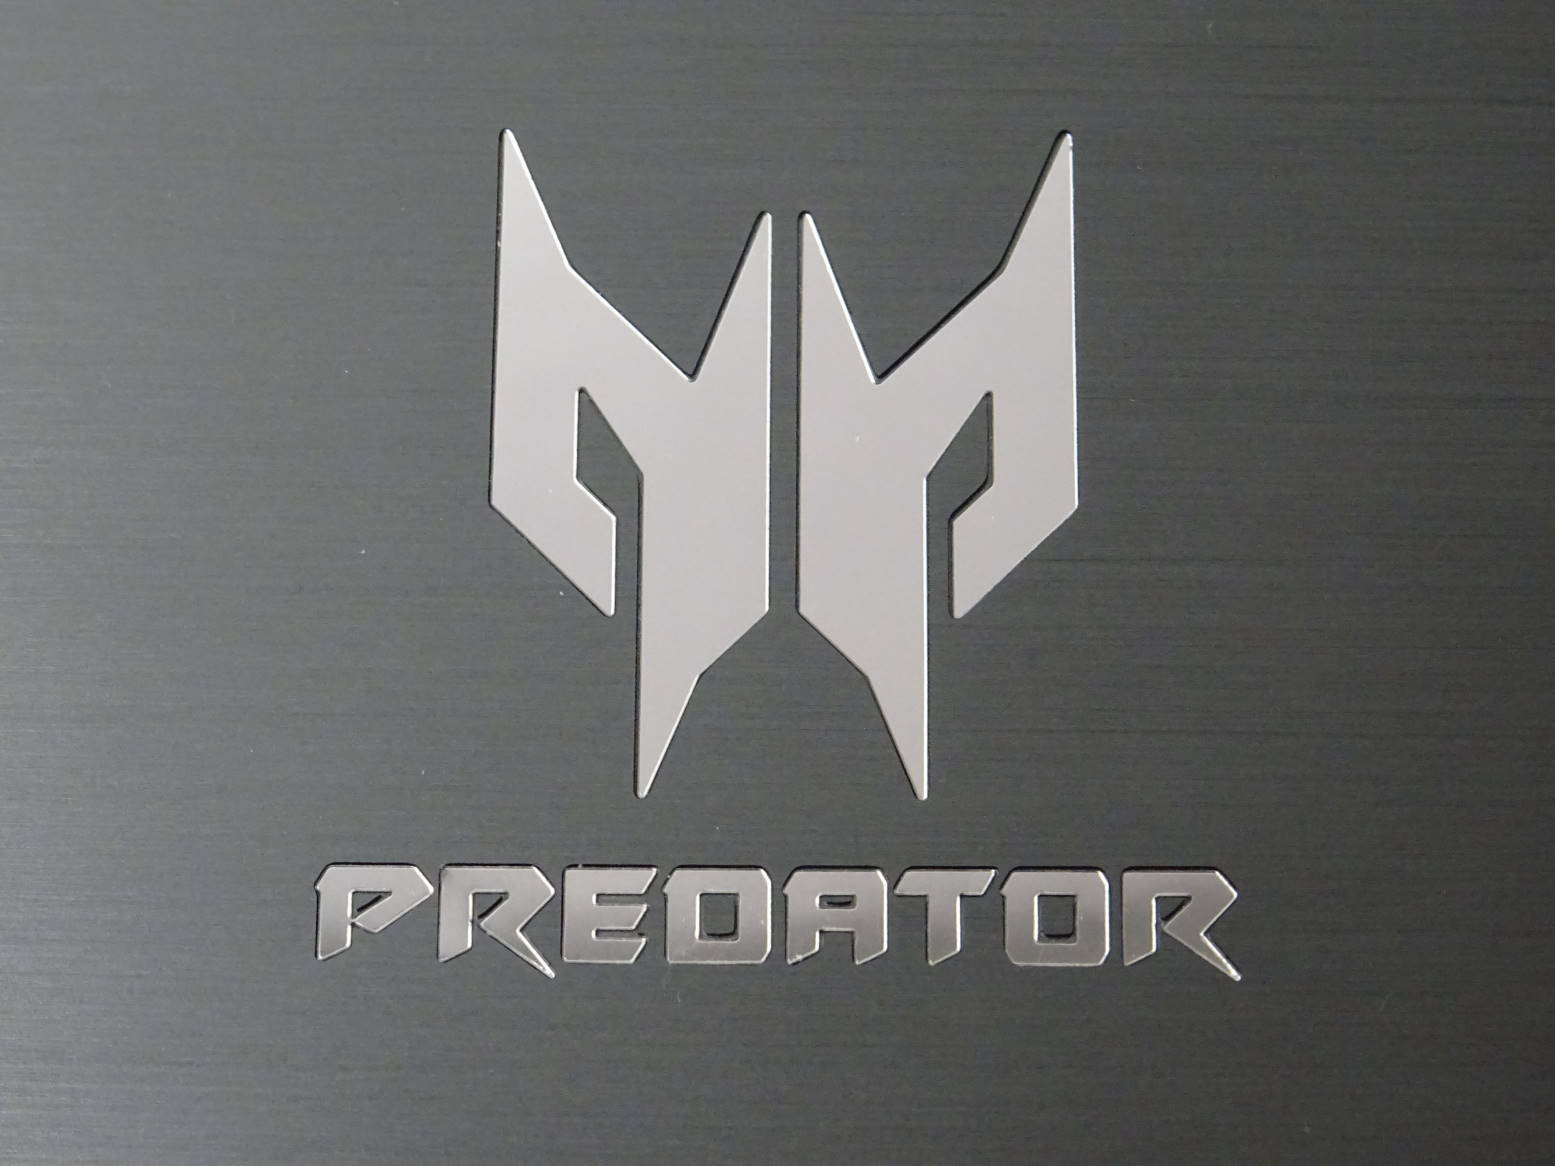 Predator 8 GT-810 ロゴ